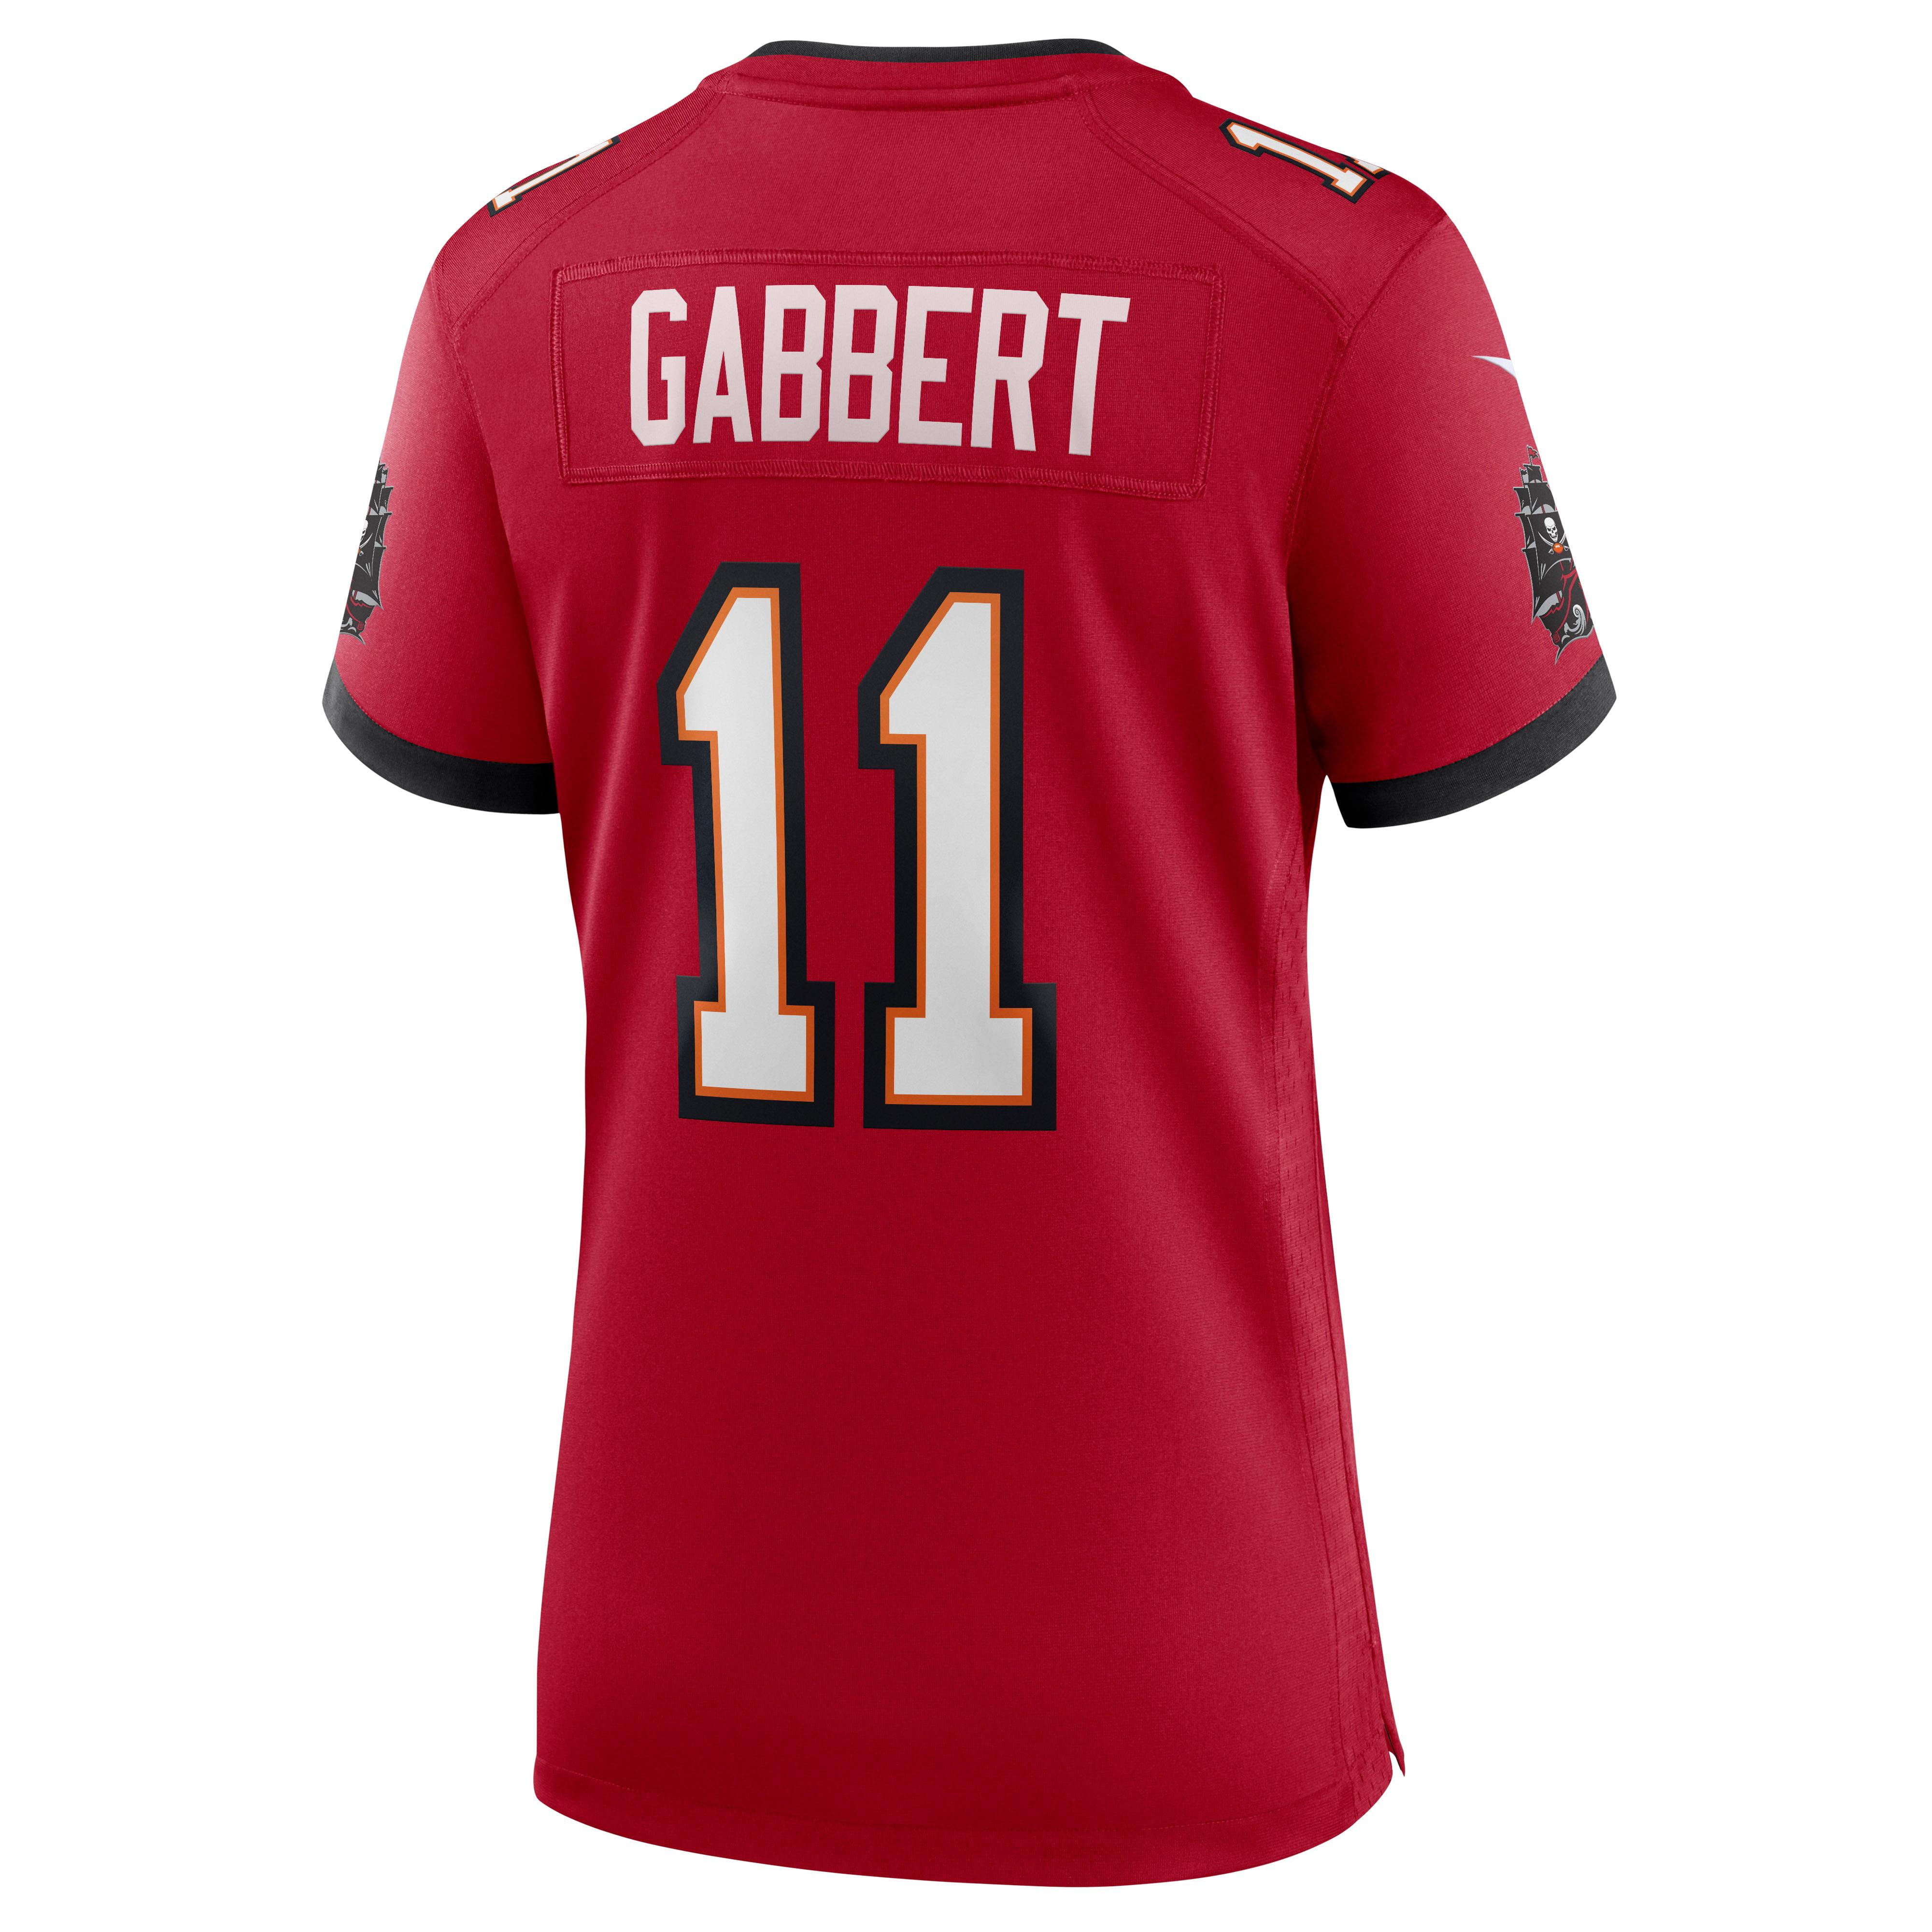 Blaine Gabbert Tampa Bay Buccaneers Nike Women's Game Jersey - Red